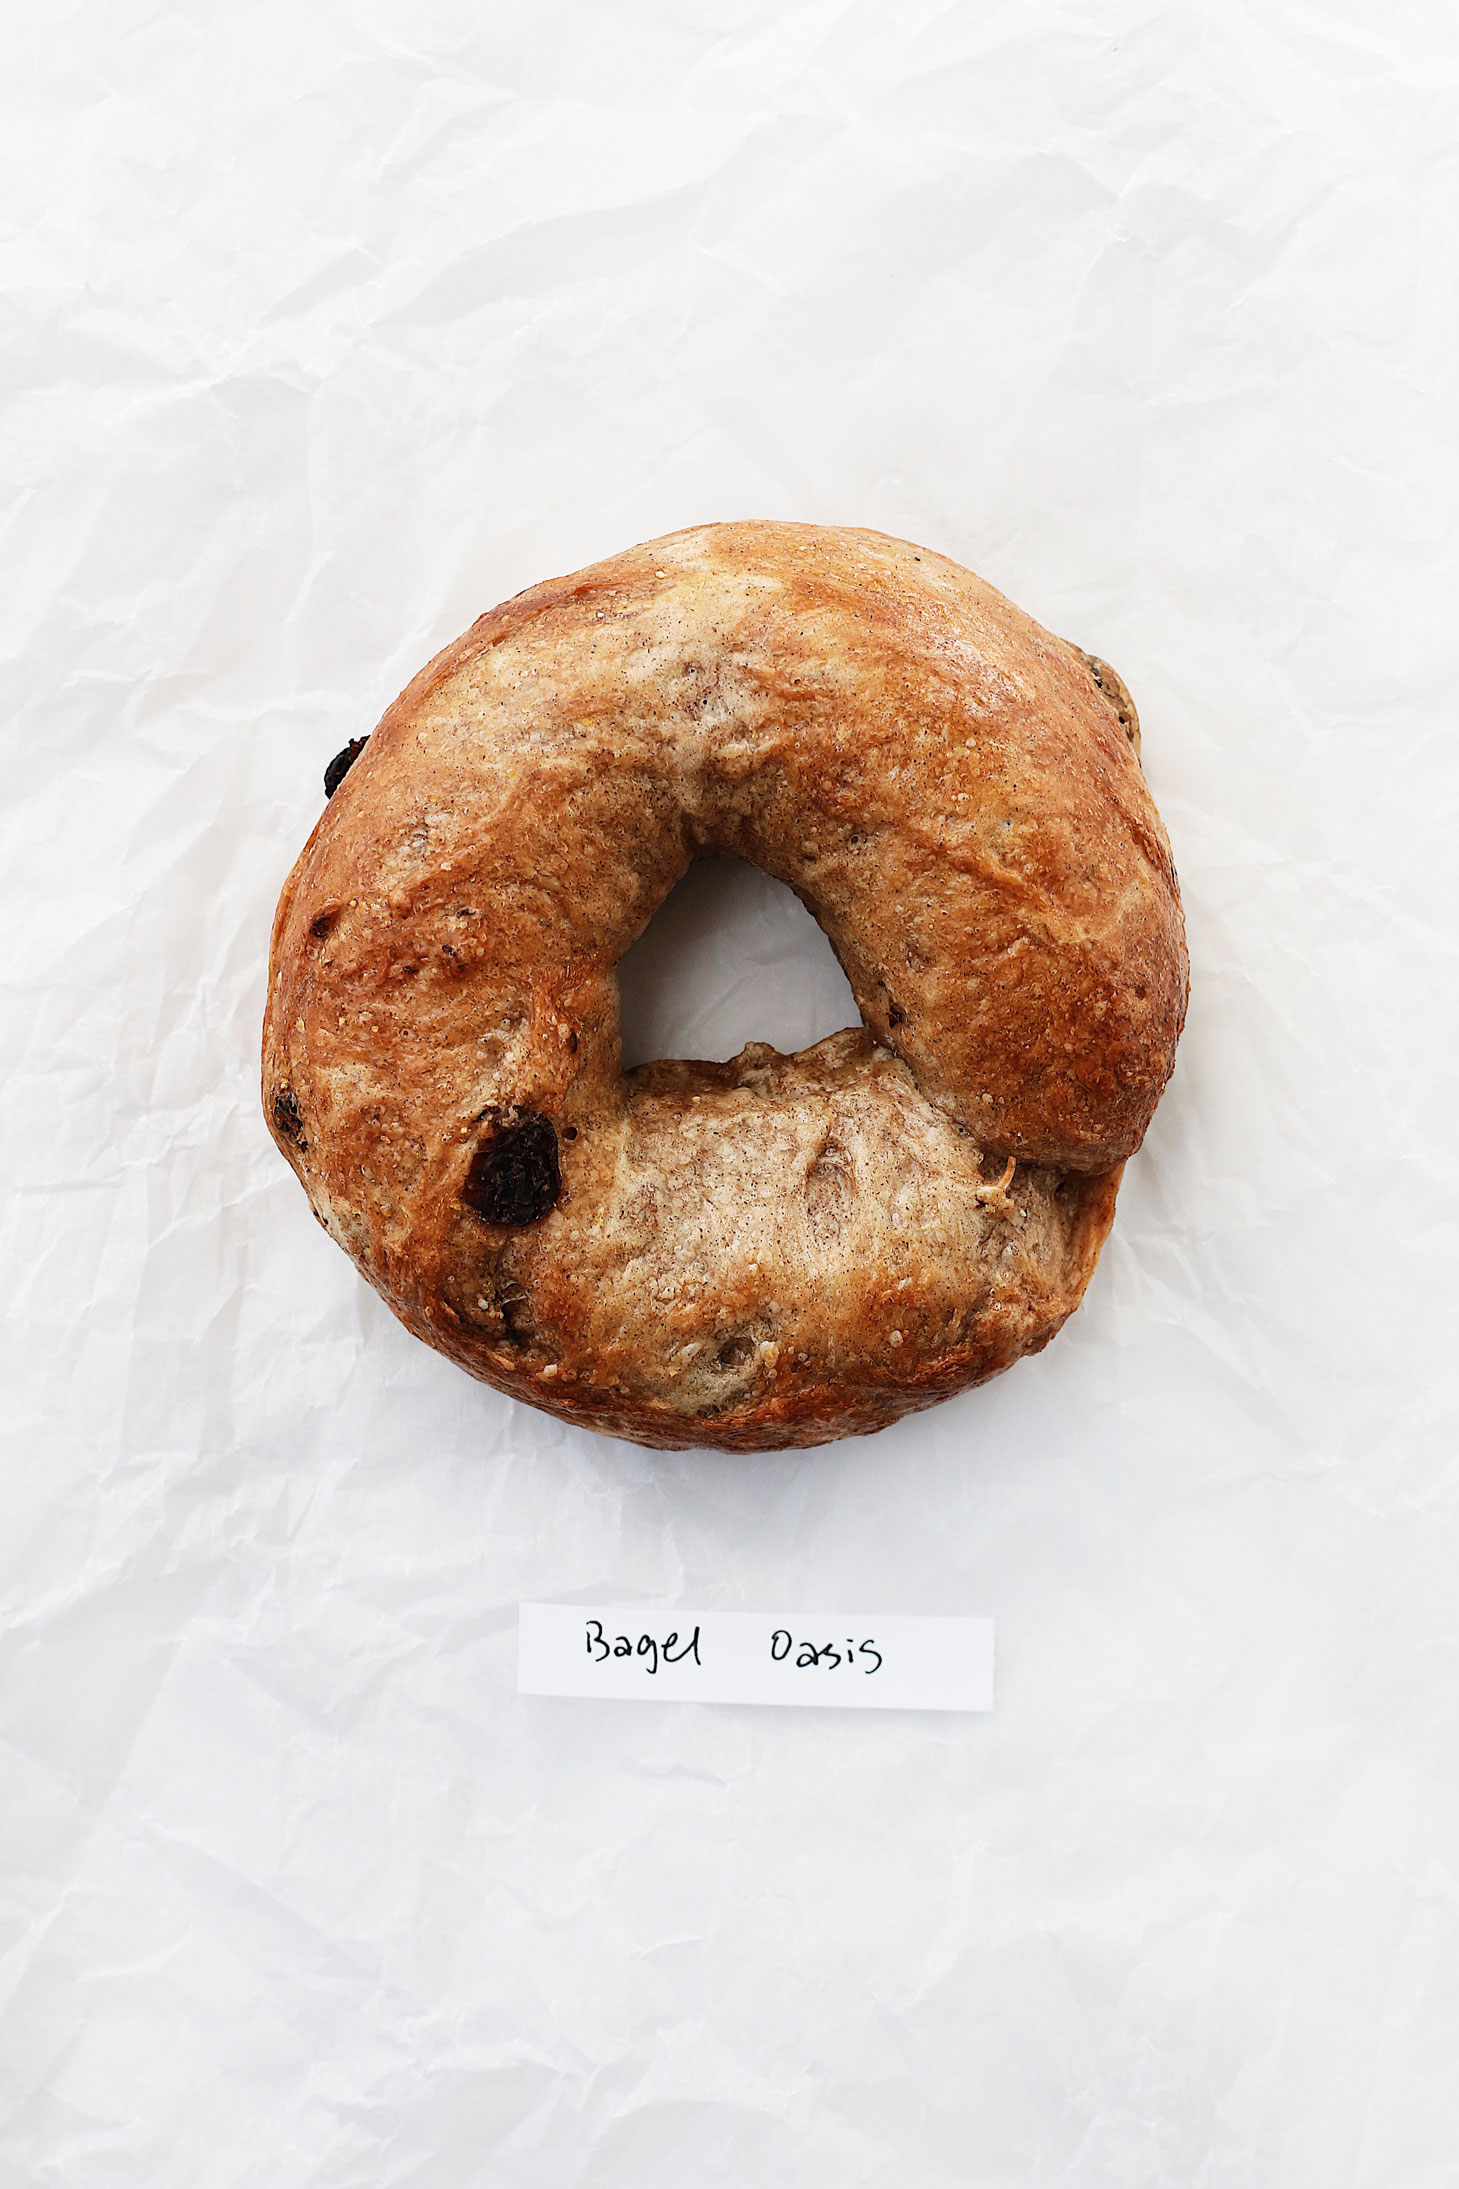 best-bagel-in-seattle-great-bagel-off-bagel-oasis-cinnamon-raisin